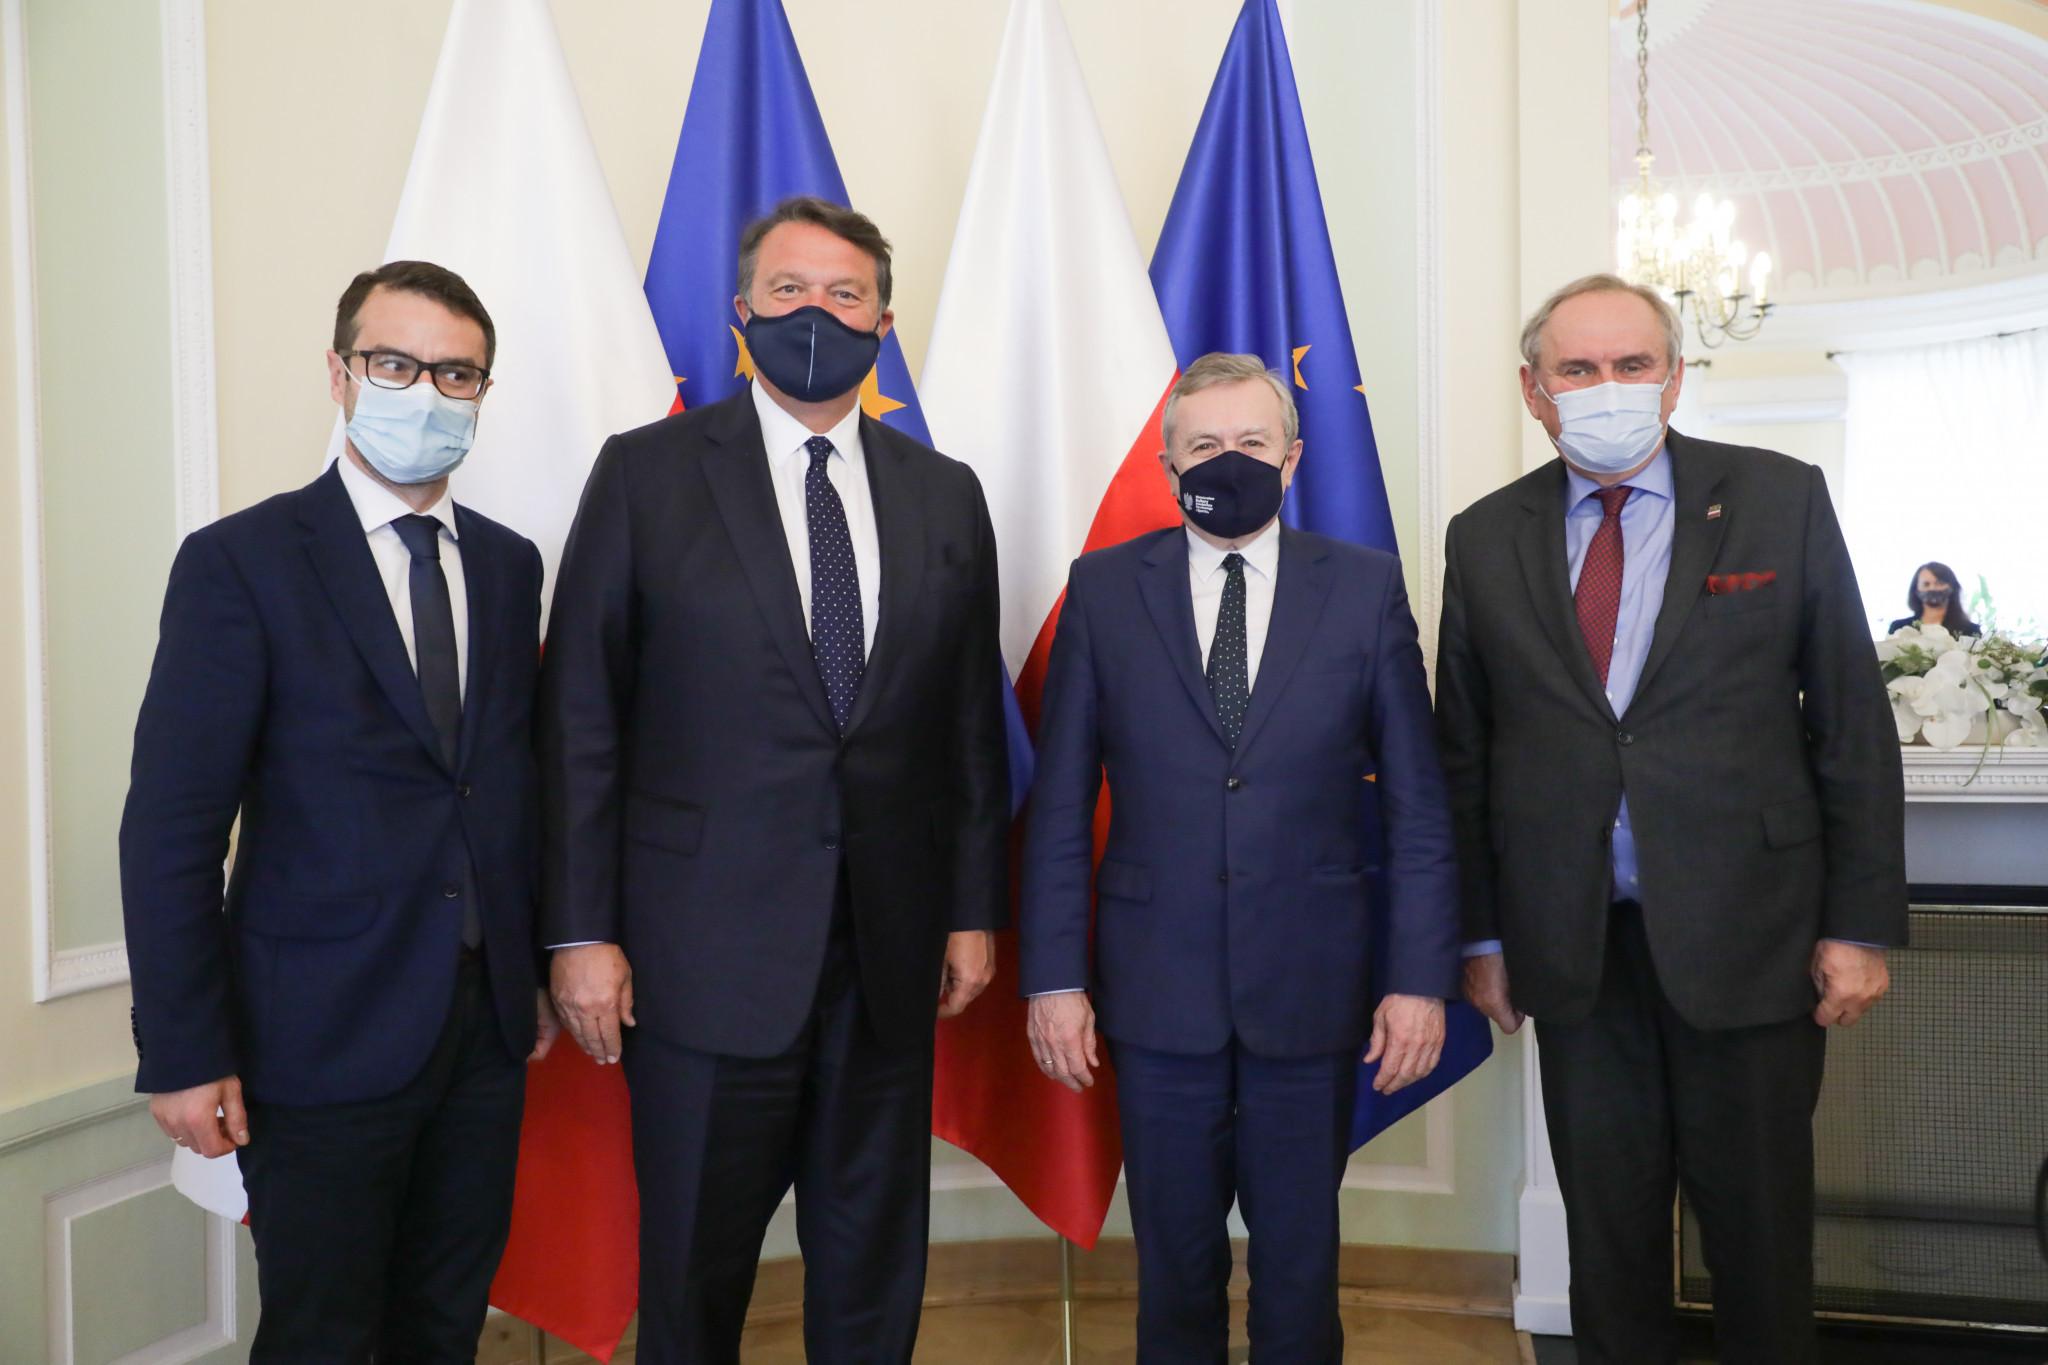 Poland's Deputy Prime Minister pledges support for European Games hosting